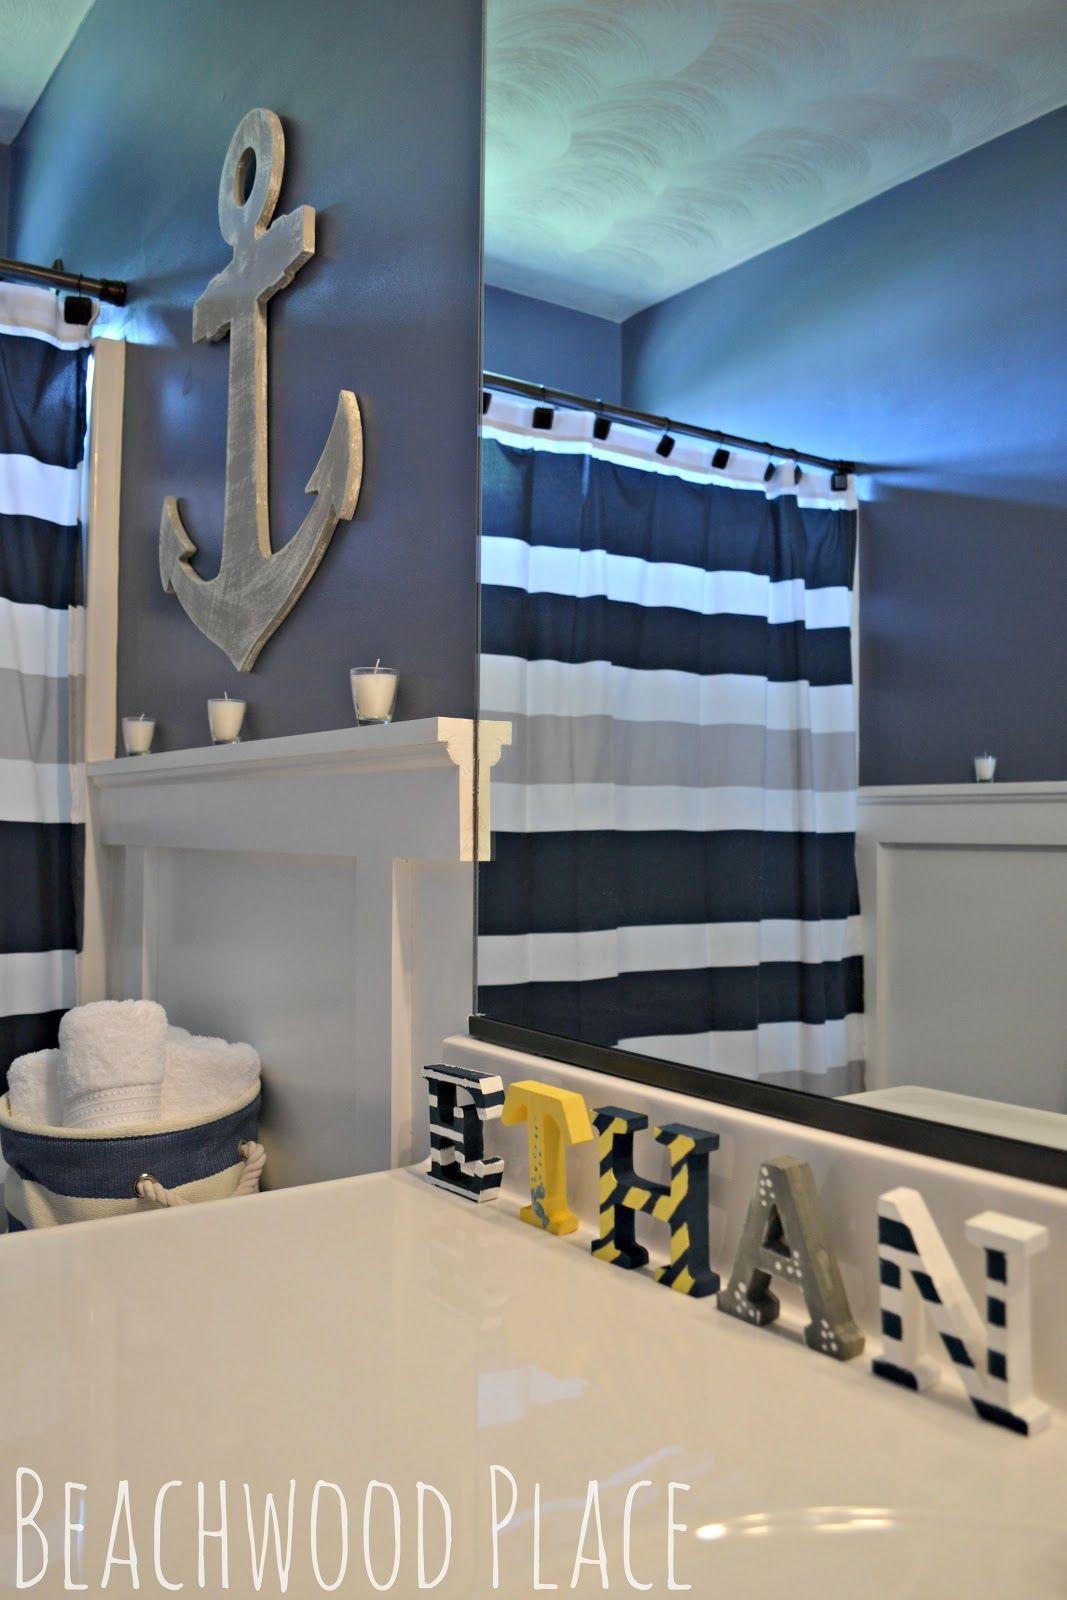 Beachwood place is a design blog featuring interior design ideas